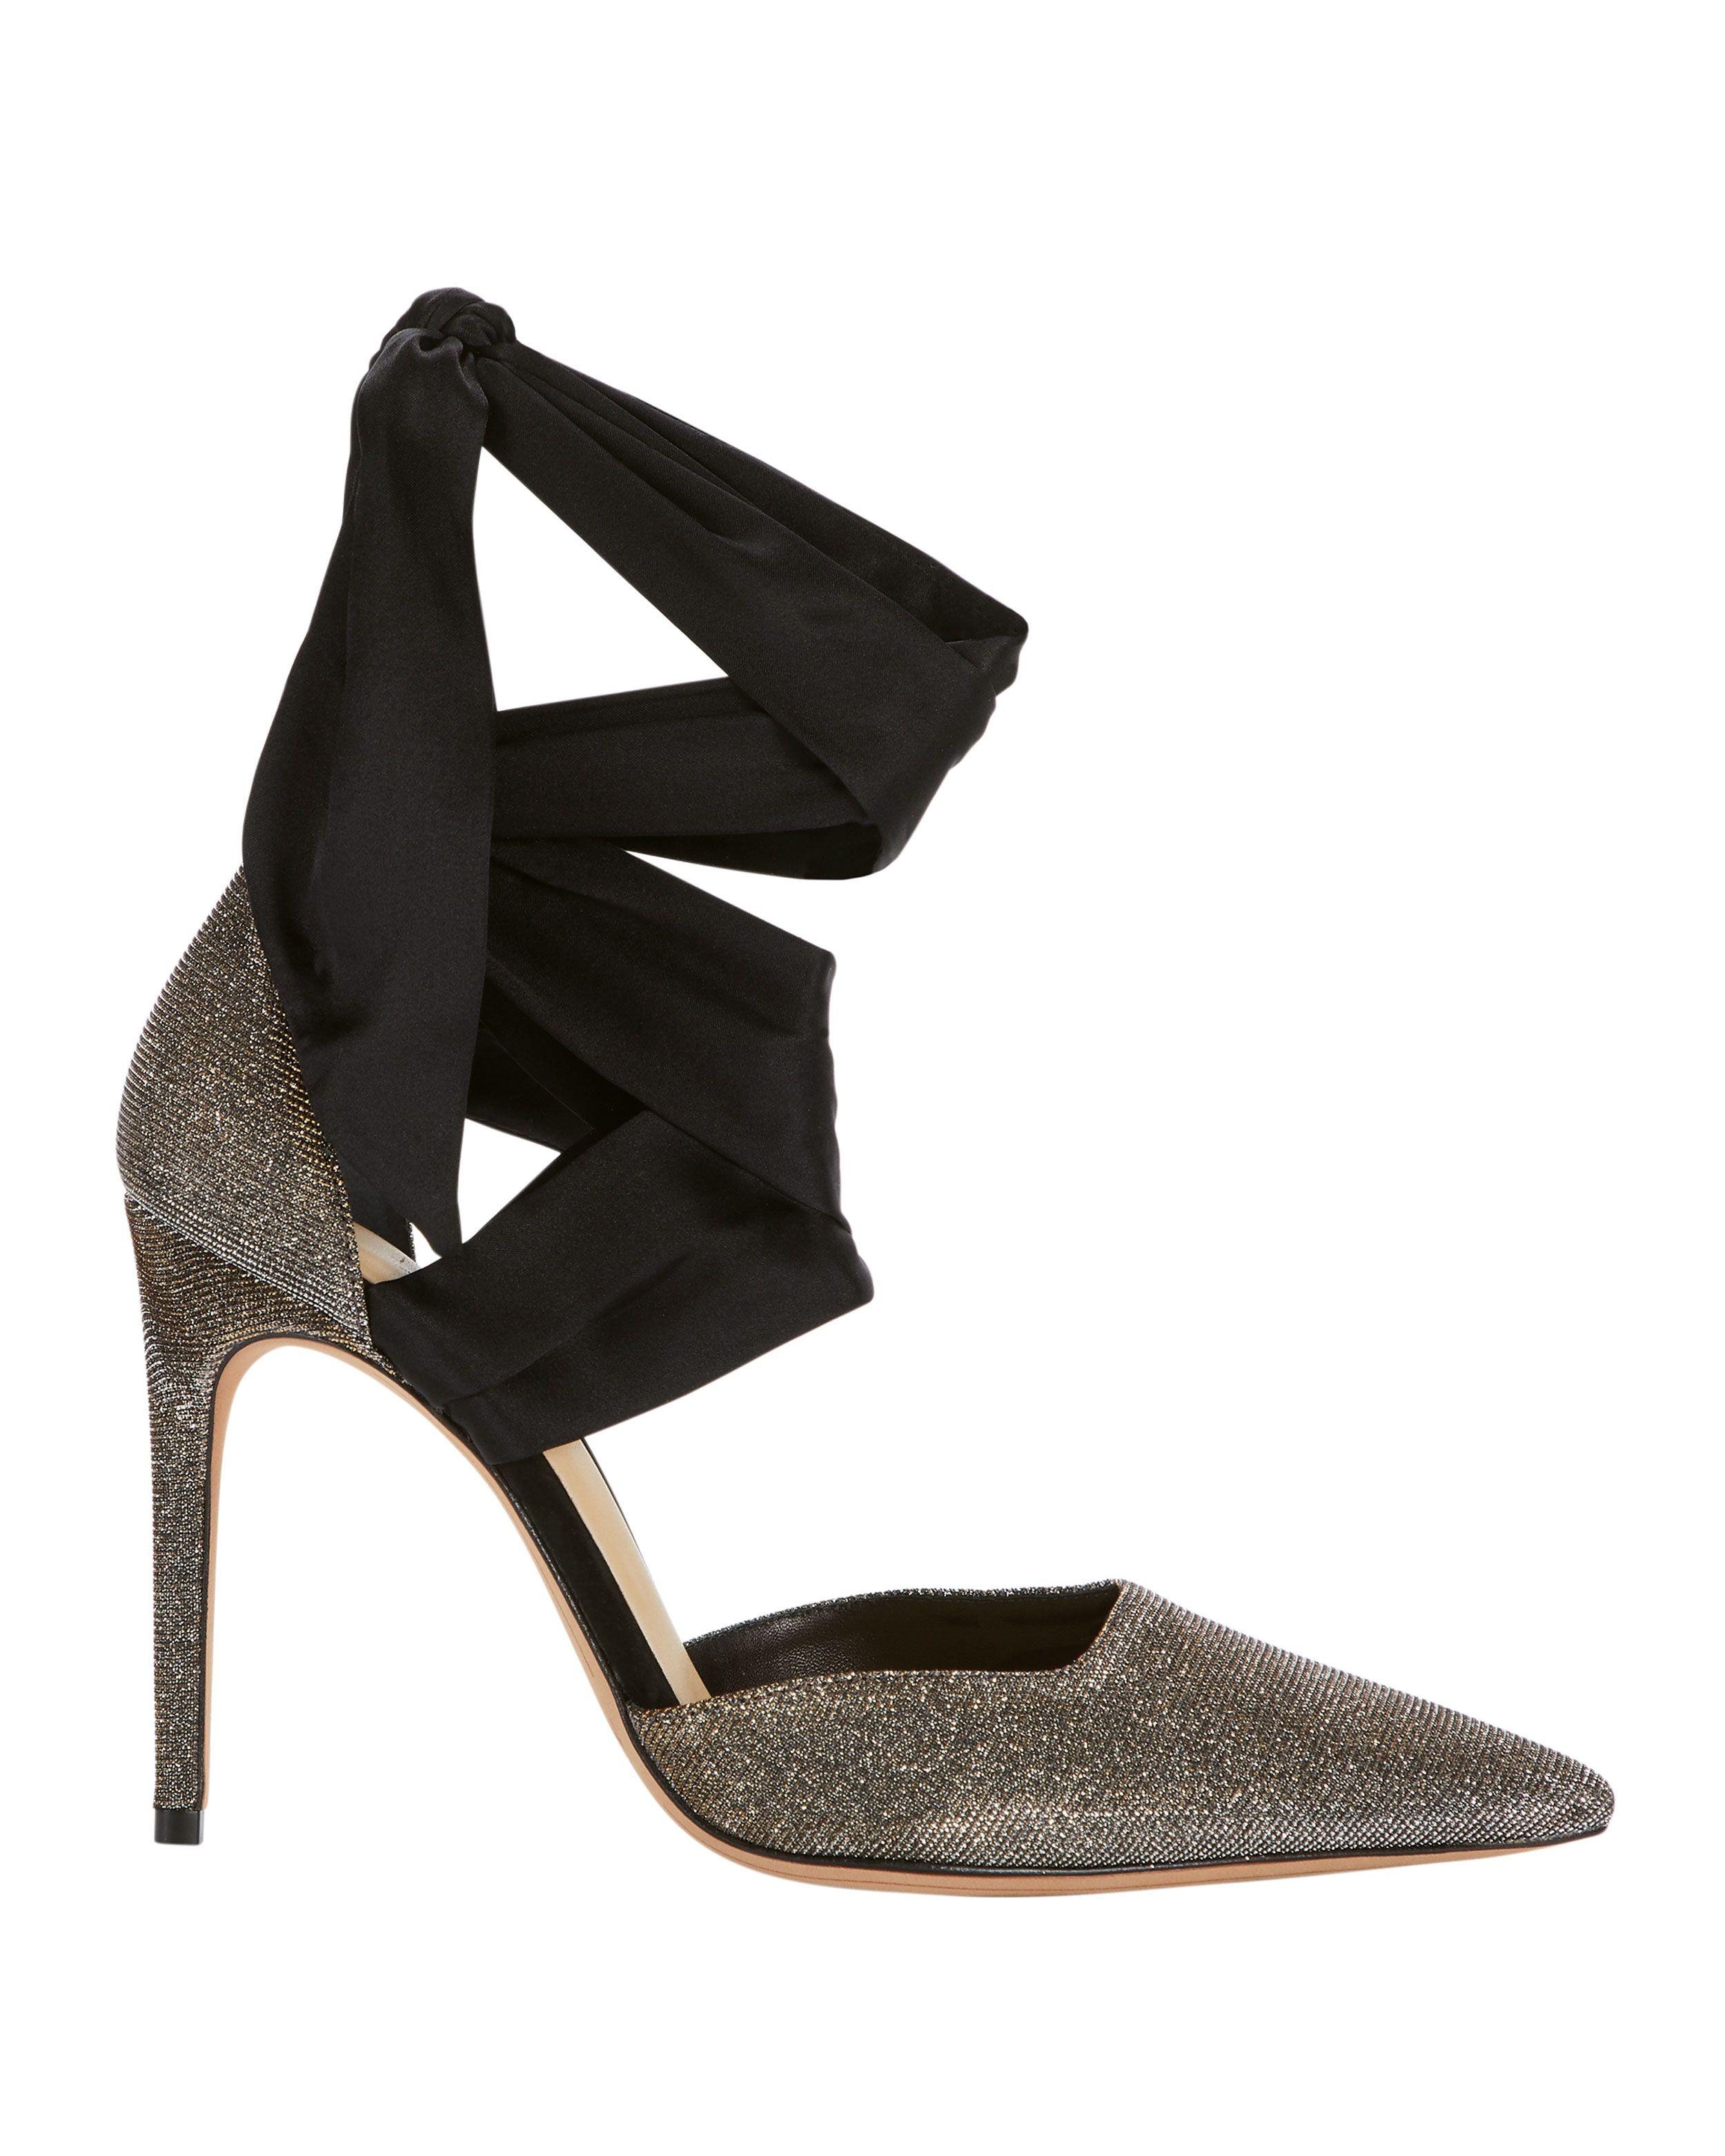 057083e4b17 ALEXANDRE BIRMAN AMALIA GLITTER PUMPS COLORBLOCK.  alexandrebirman  shoes